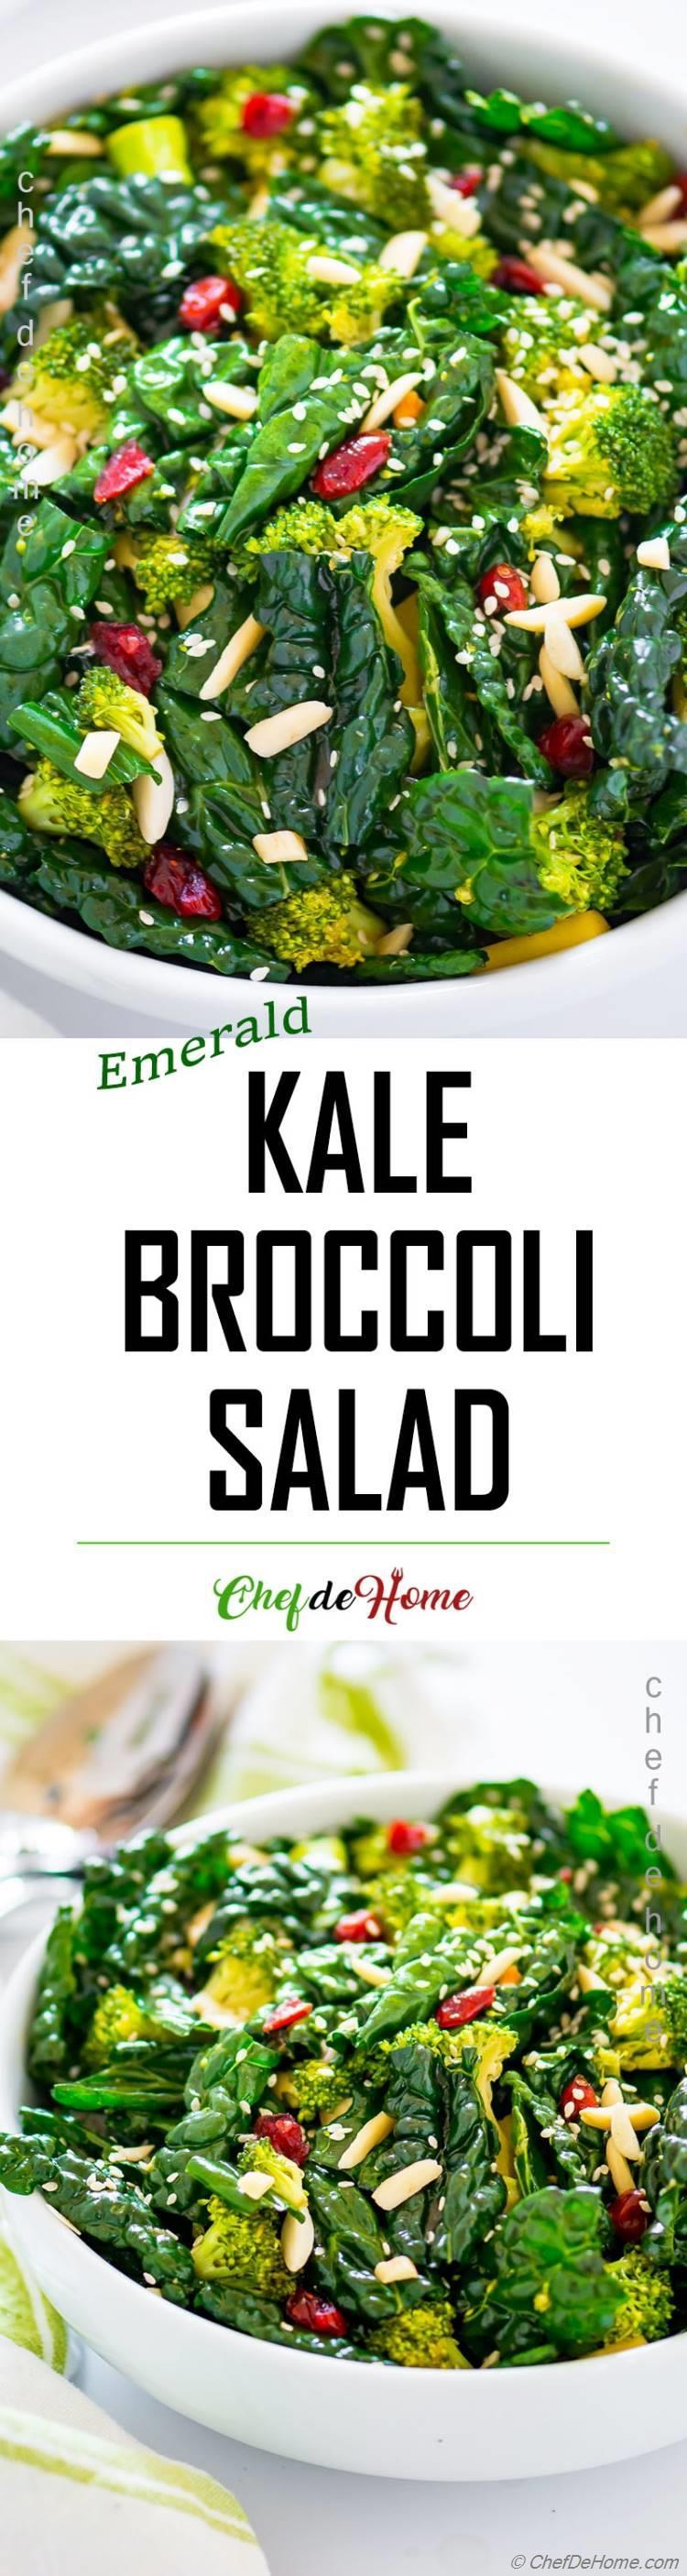 Healthy Kale Broccoli Salad